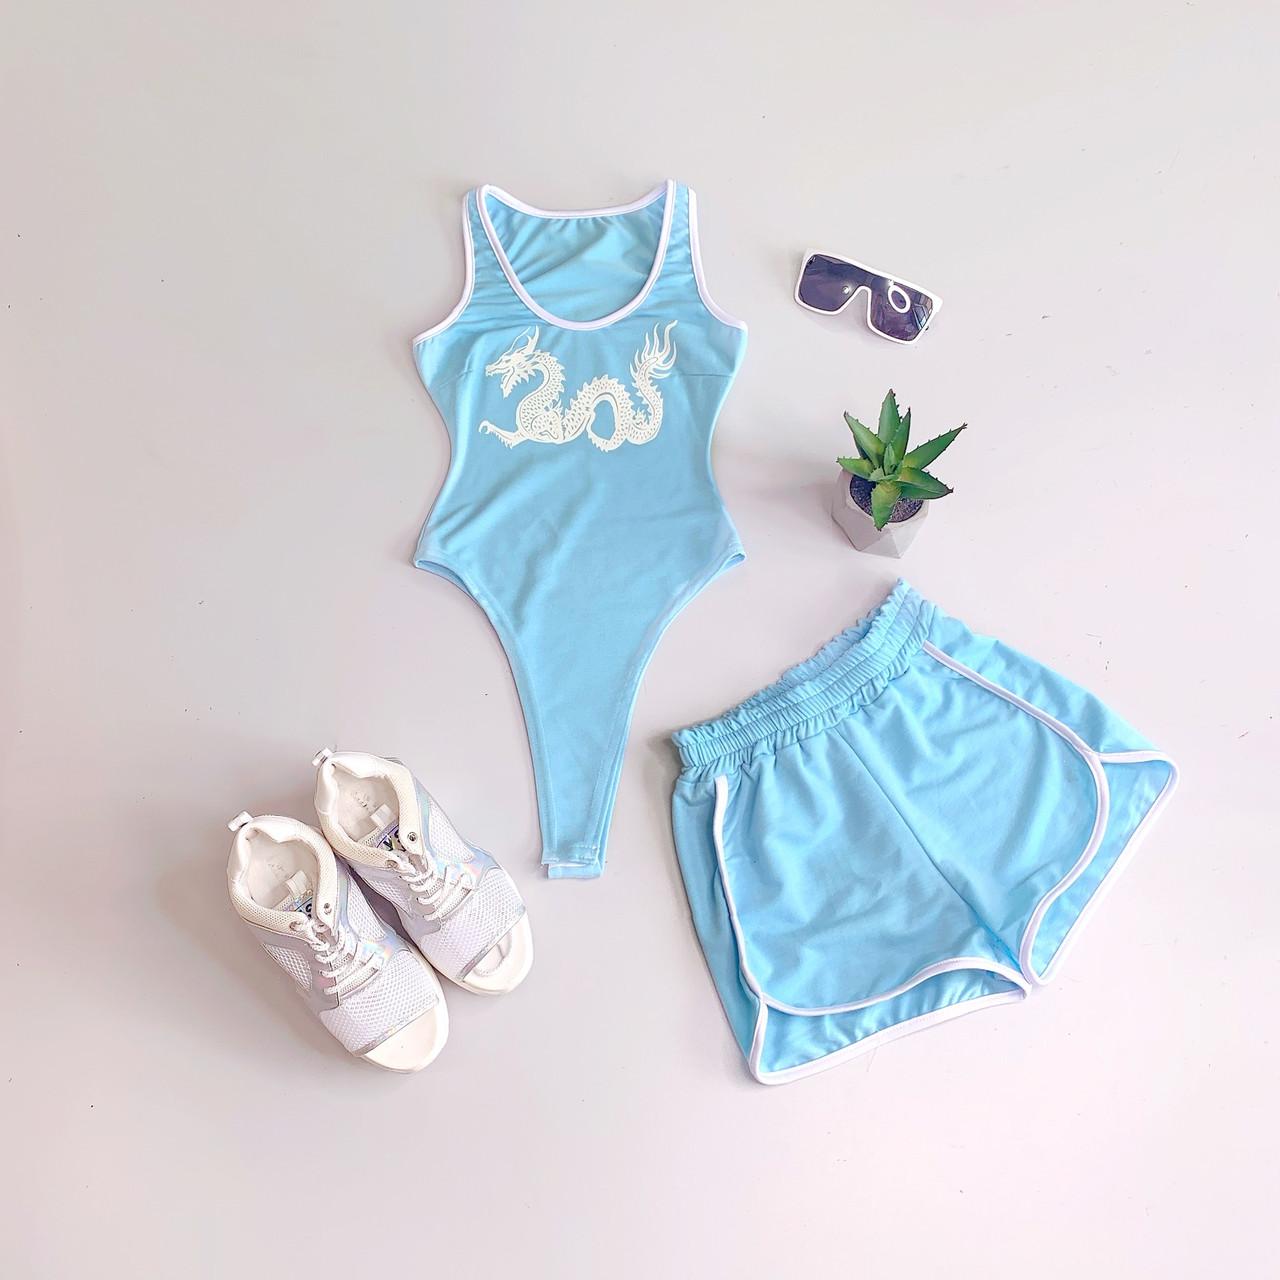 Женский летний спортивный костюм с шортами и боди без рукава tez6605992Е